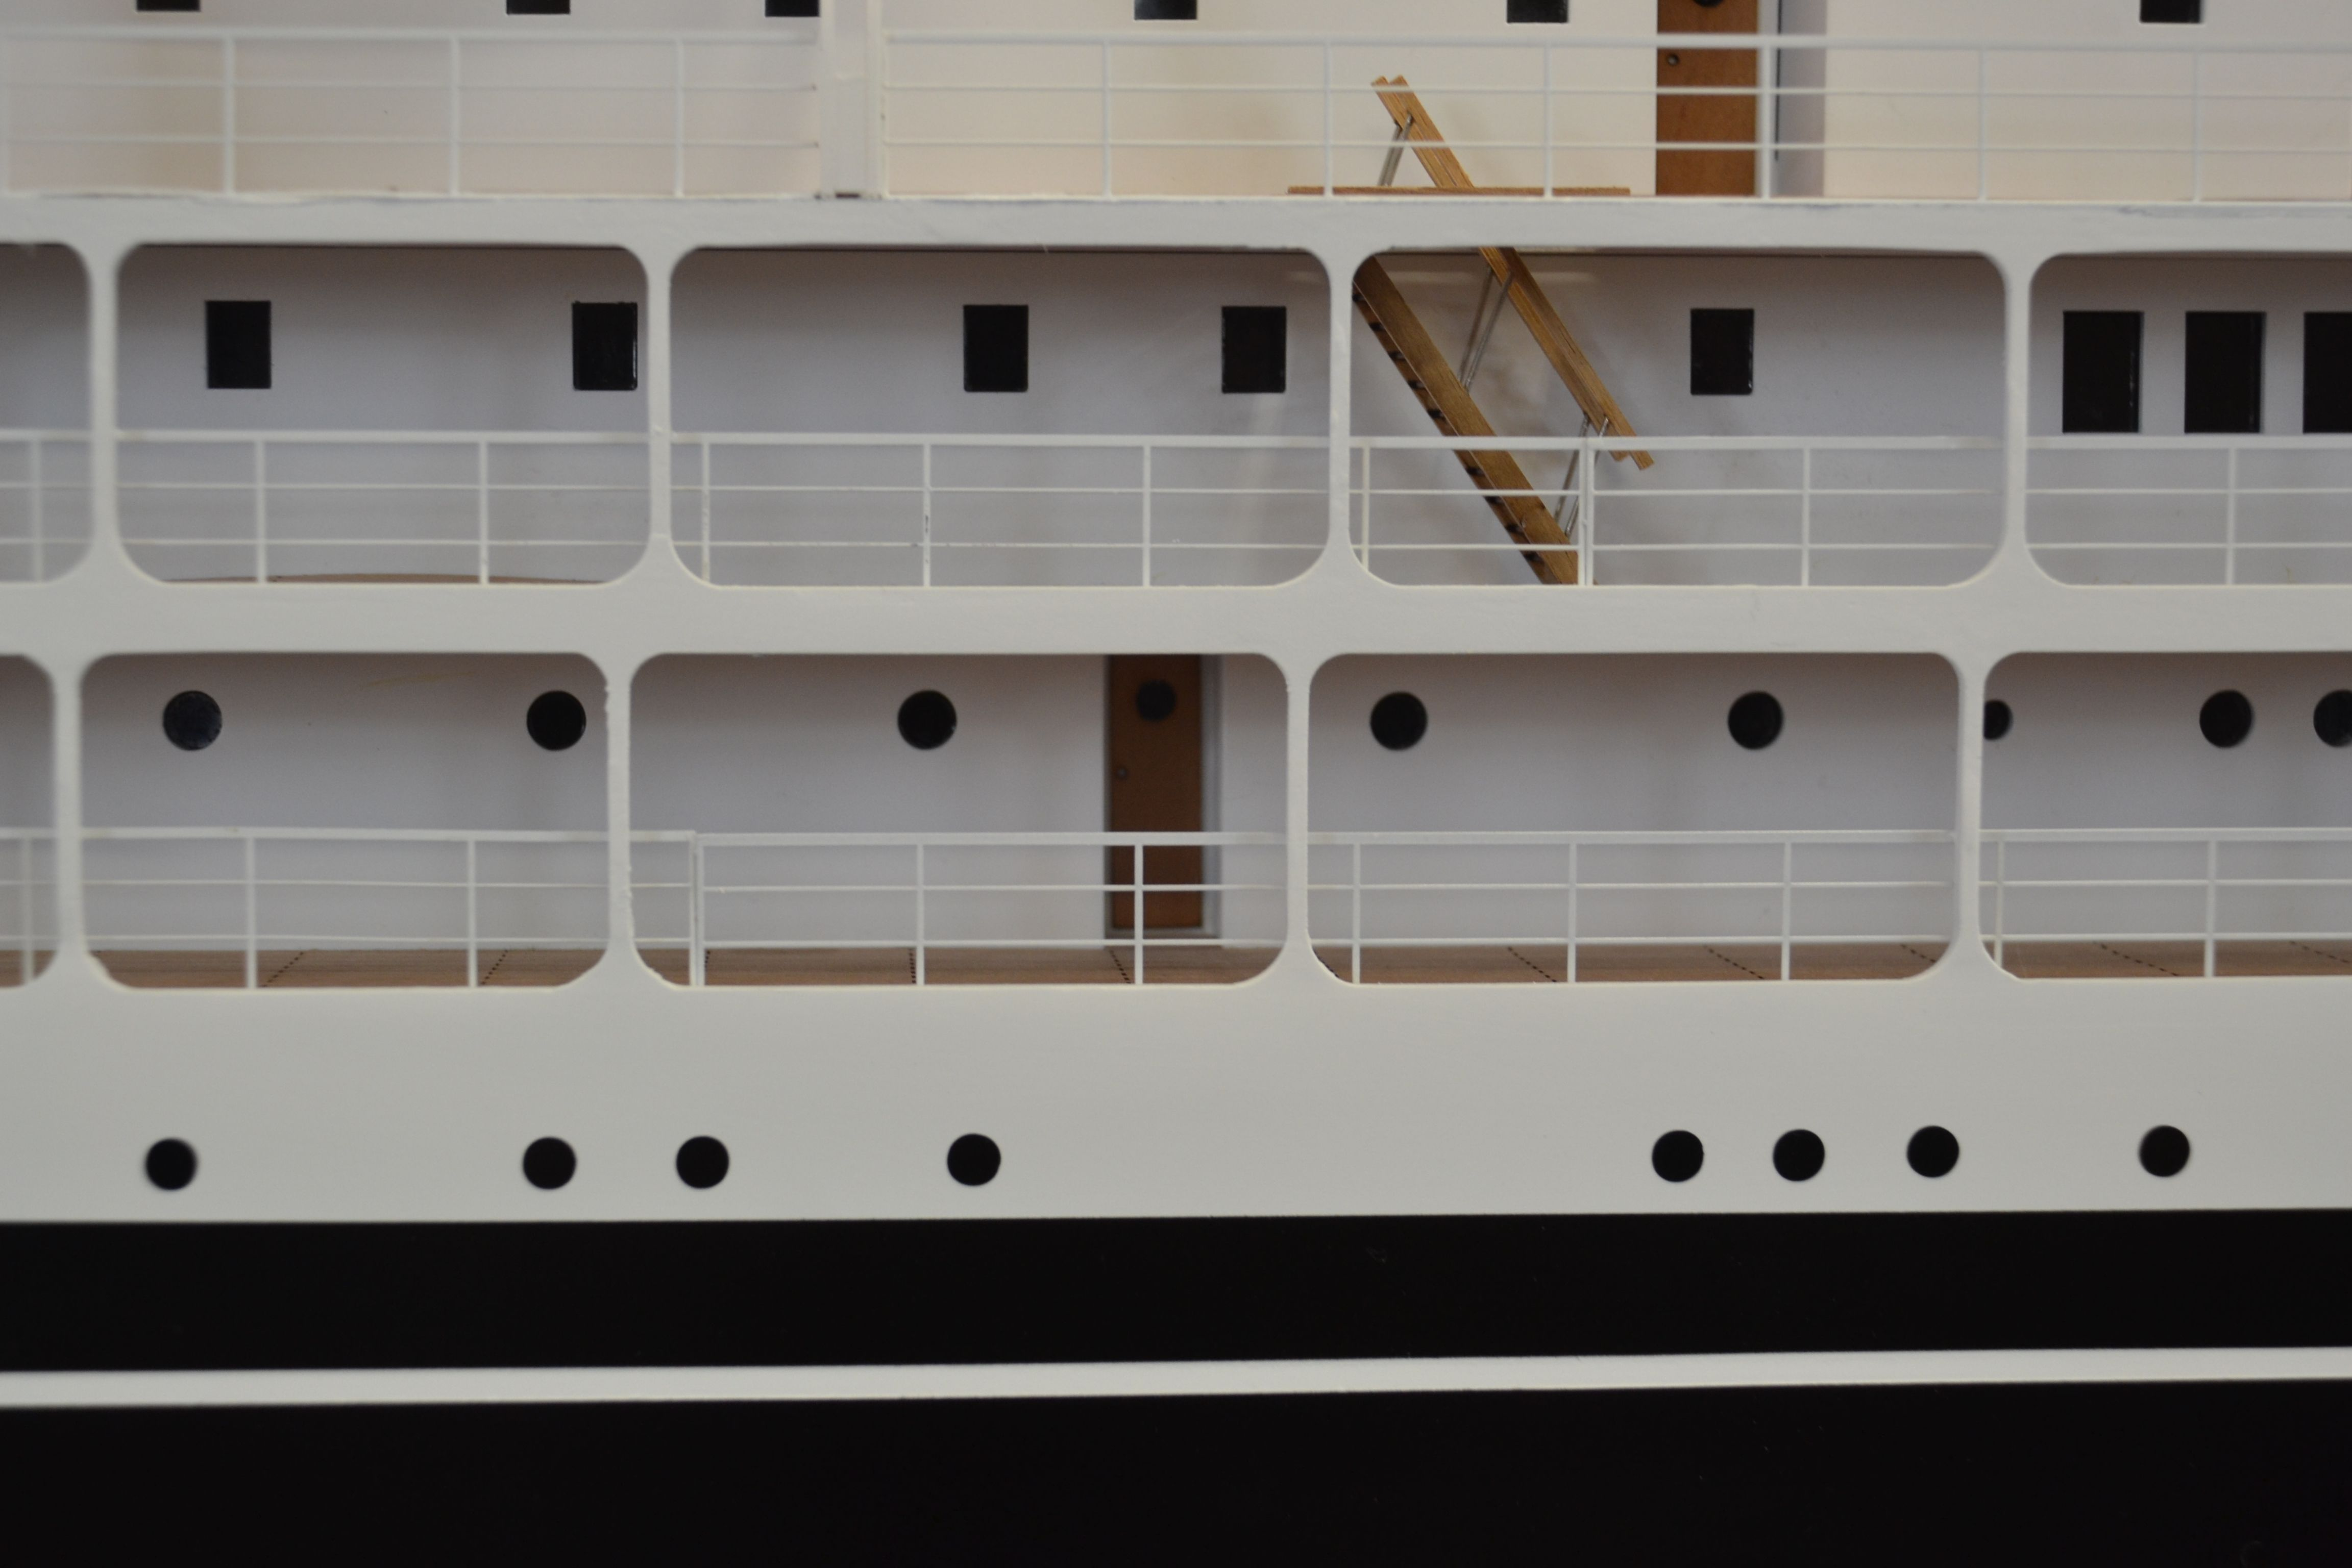 2209-12985-SS-Corinthic-Model-Ship